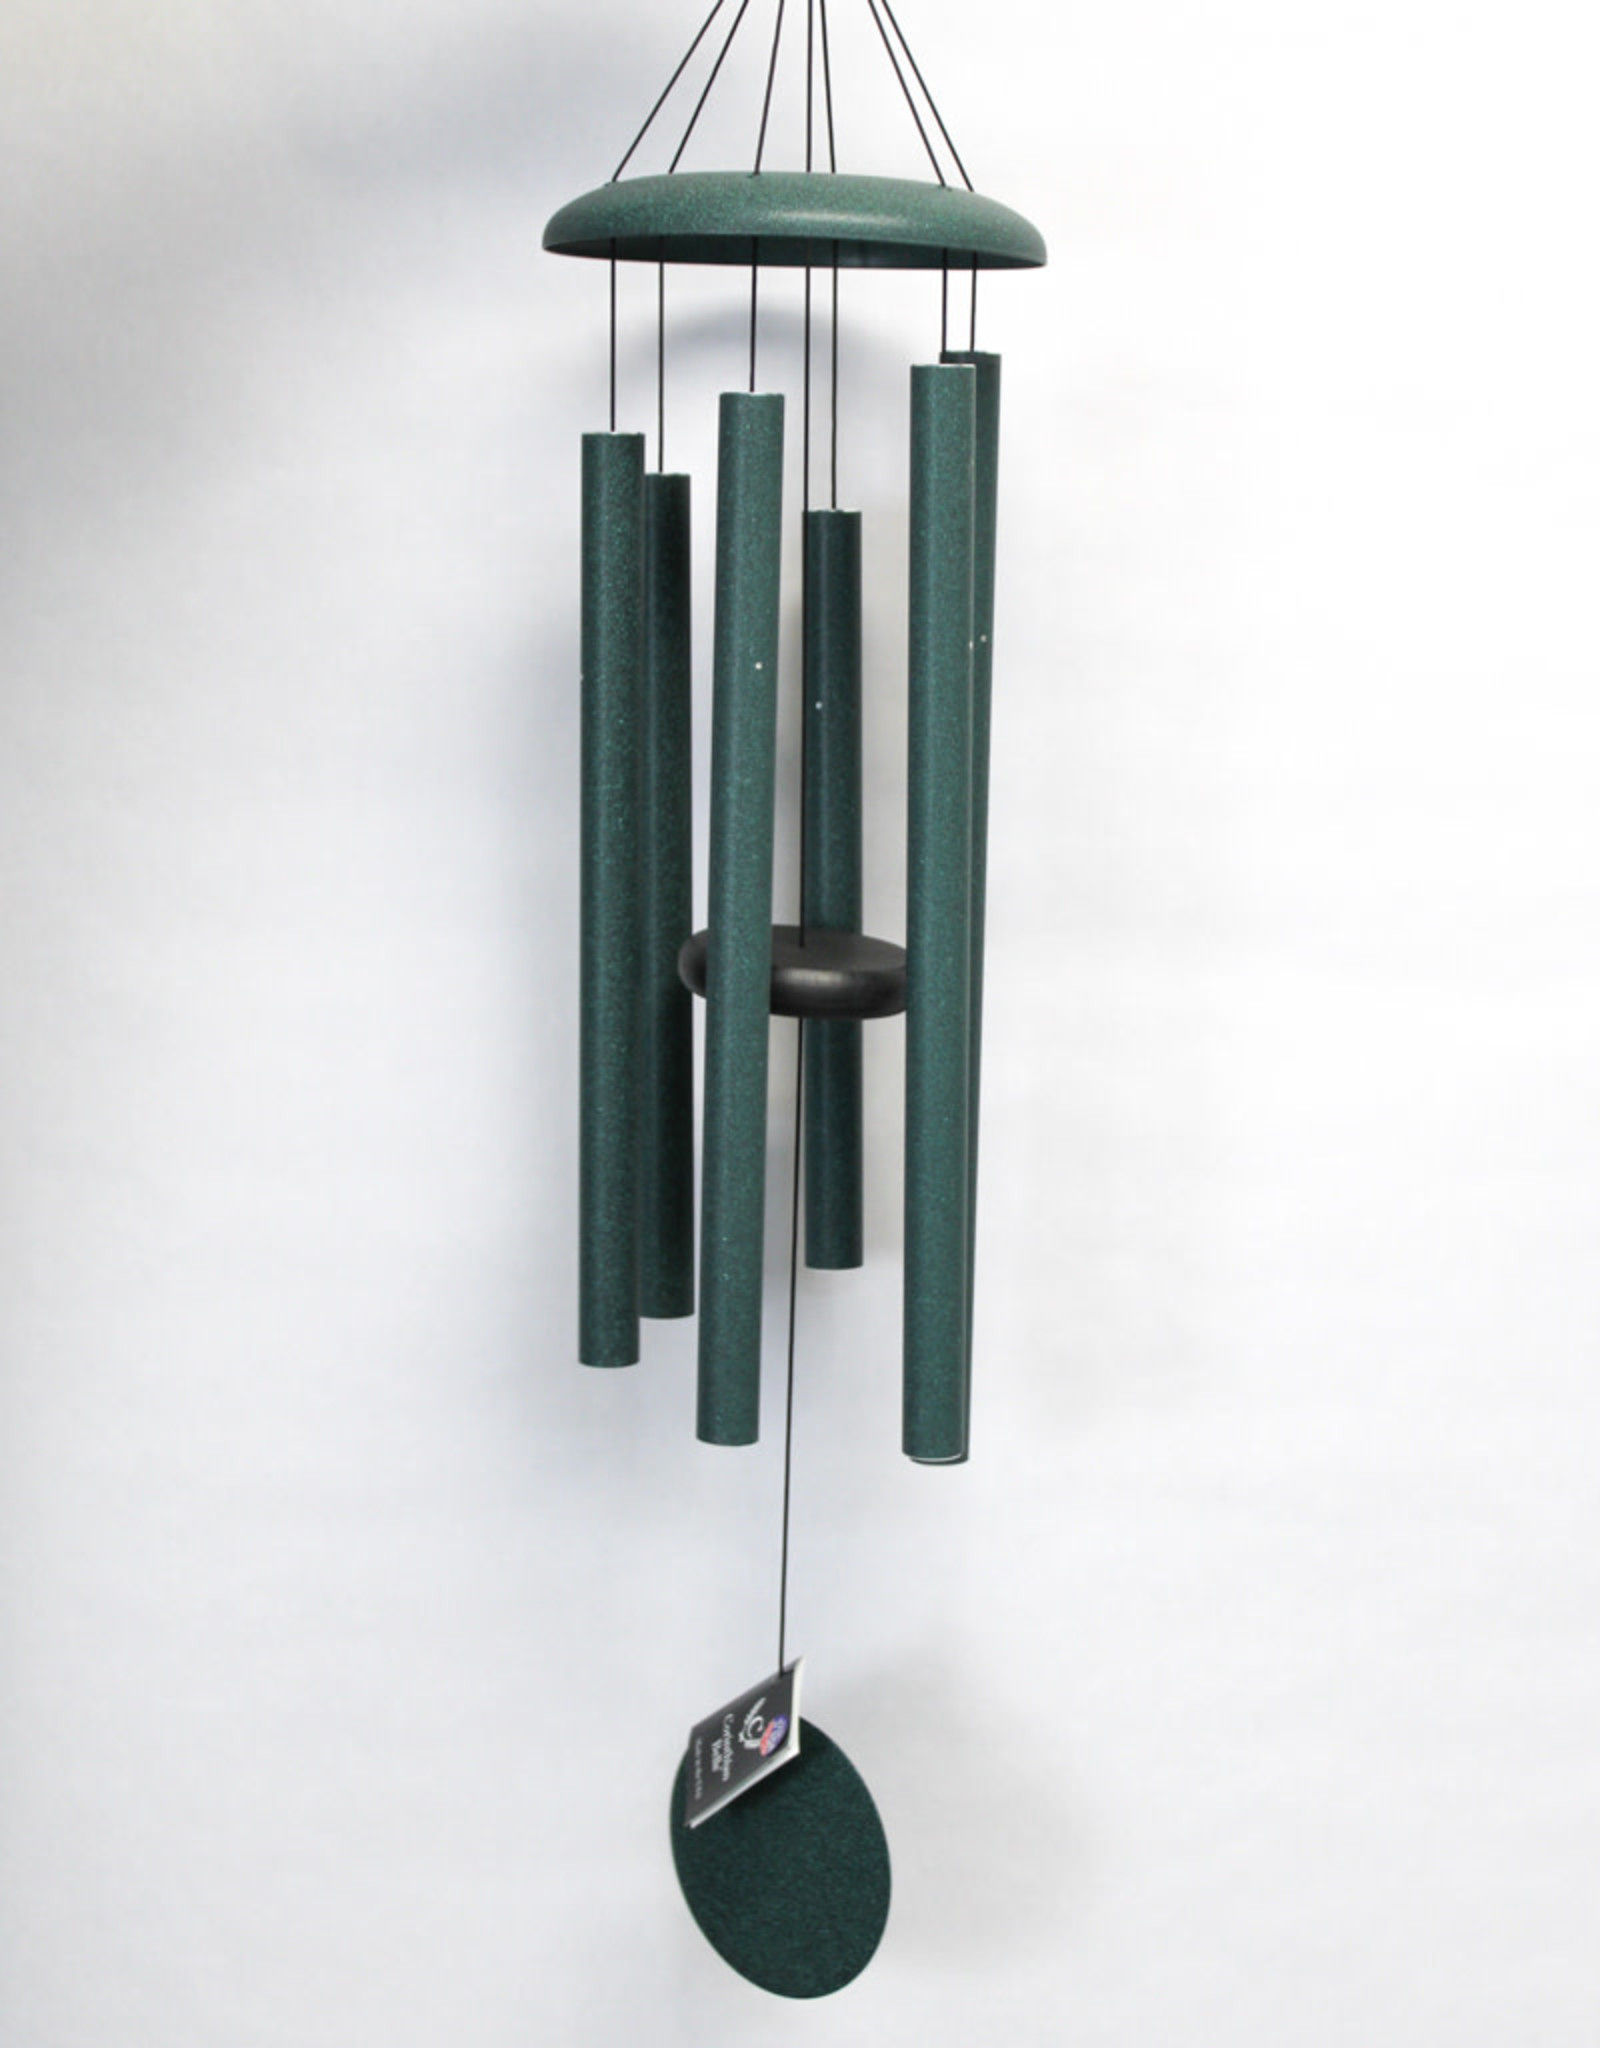 QMT Windchimes 36'' Green Chime